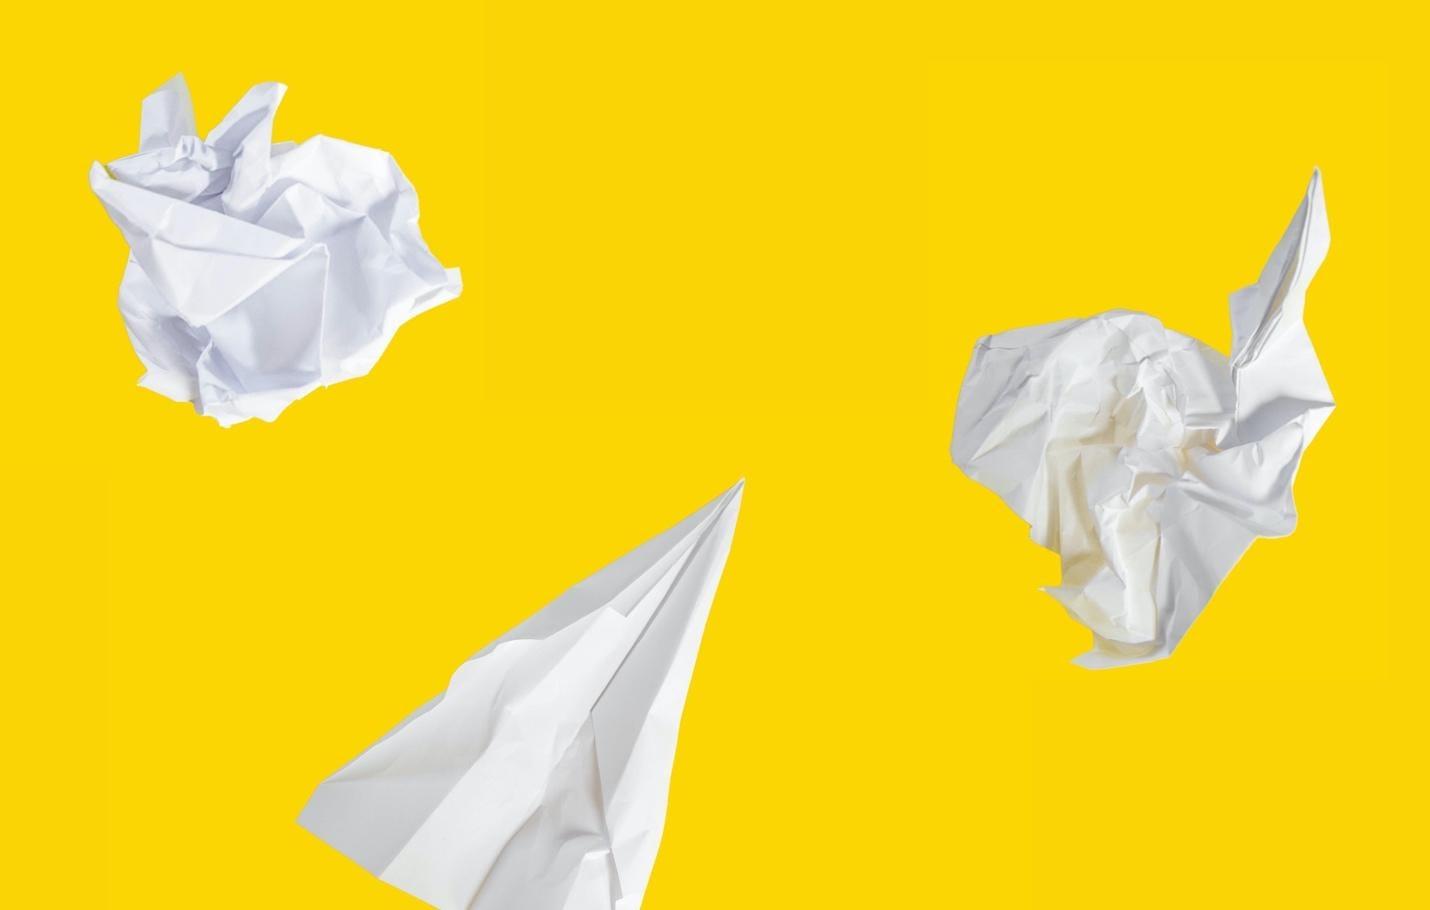 Reclaiming Buzzwords: Richard DeVaul Wants to Demystify Innovation